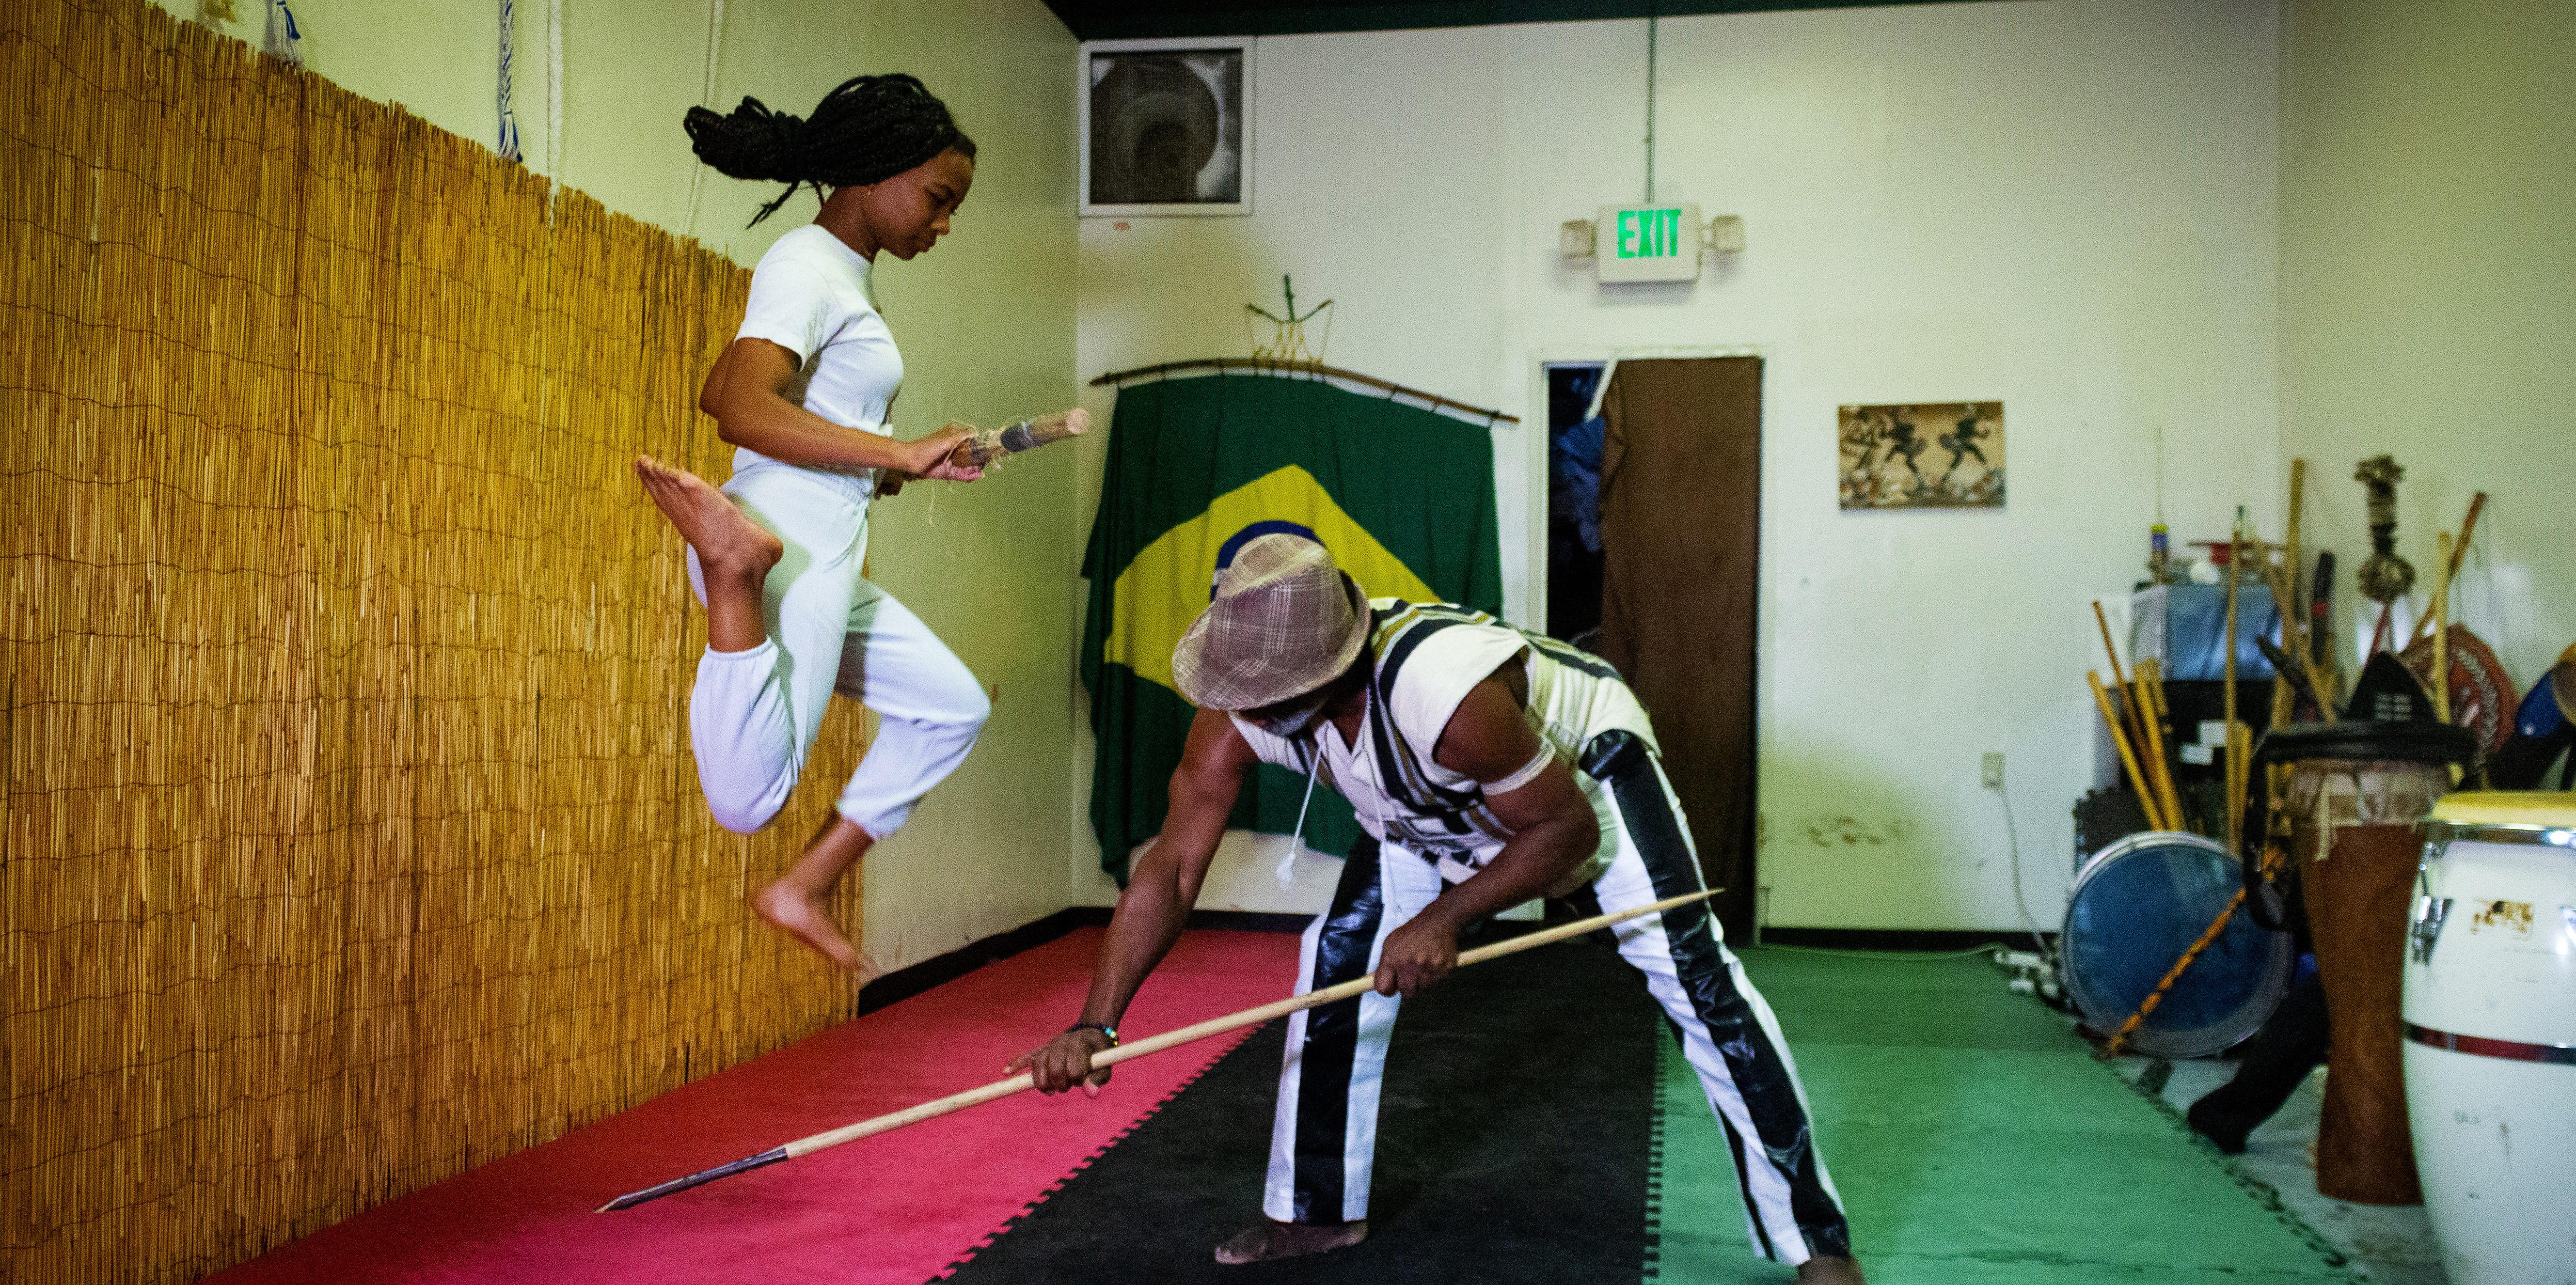 Nadia leaps over Dennis stick_edited